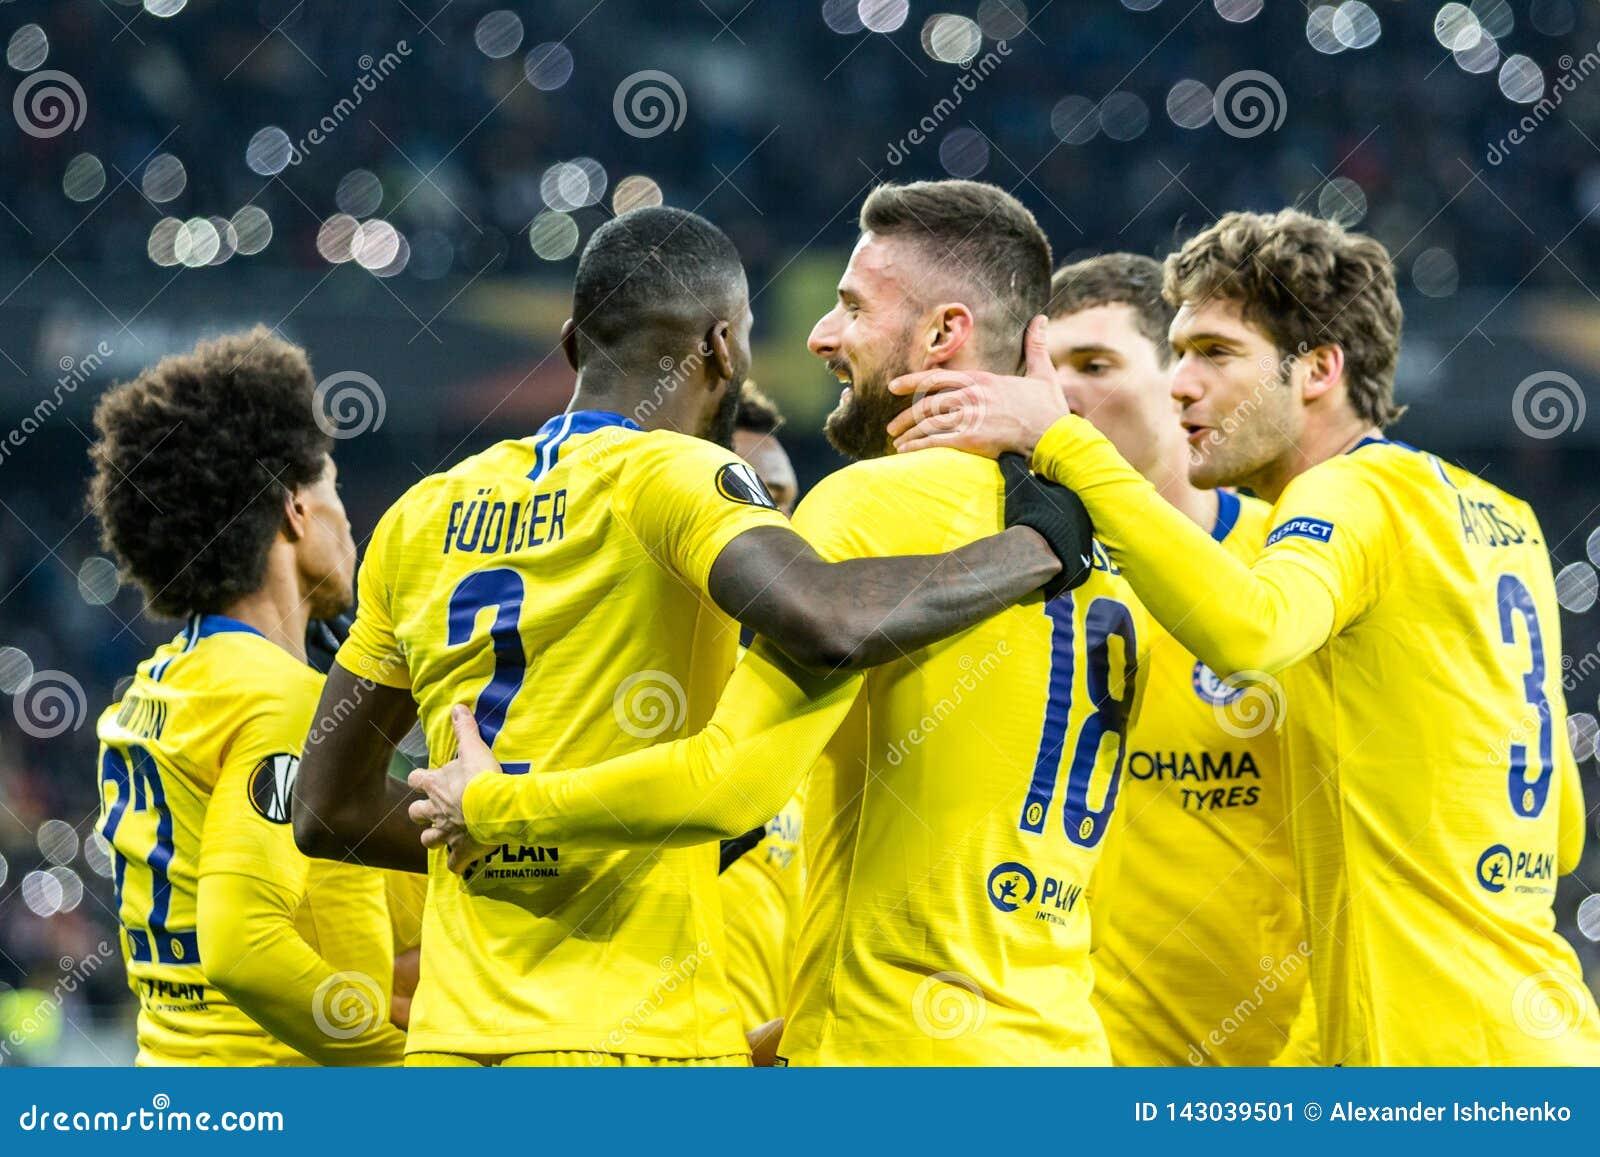 UEFA Europa League football match Dynamo Kyiv – Chelsea, March 14, 2019